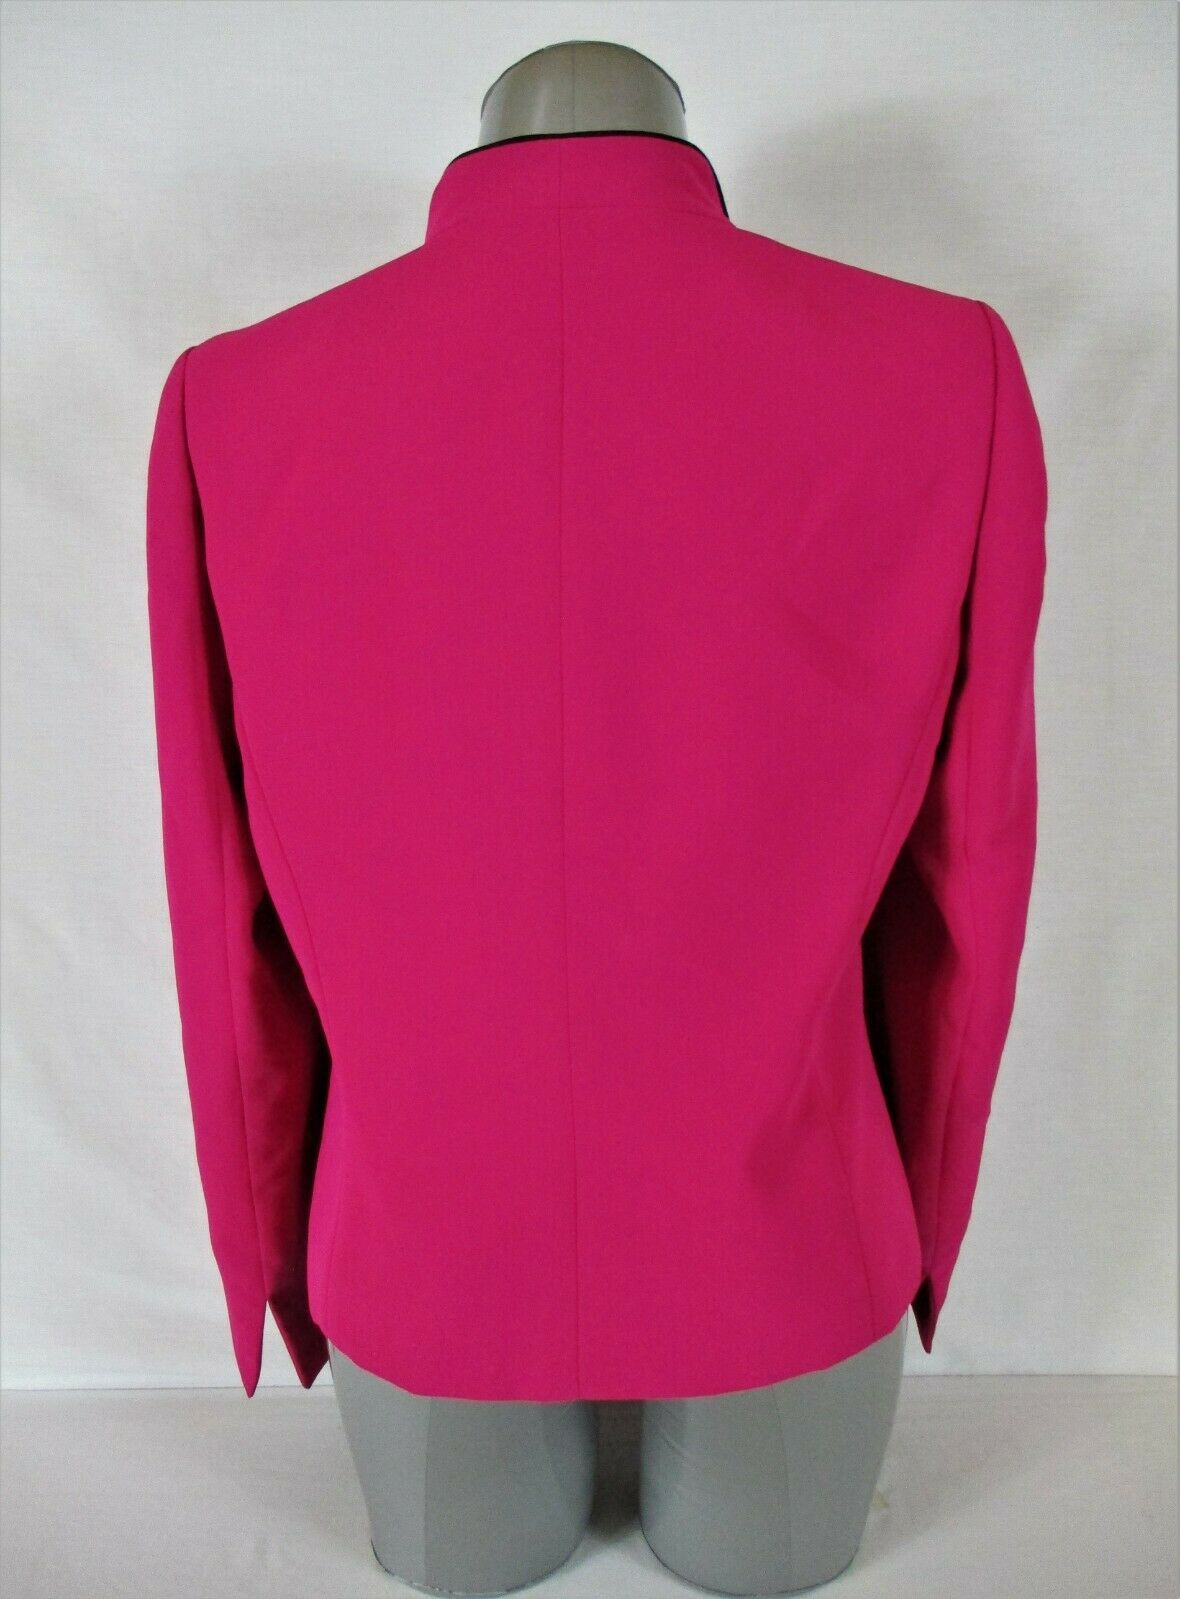 JONES STUDIO womens Sz 10 L/S hot pink FULLY LINED button down jacket (B4)